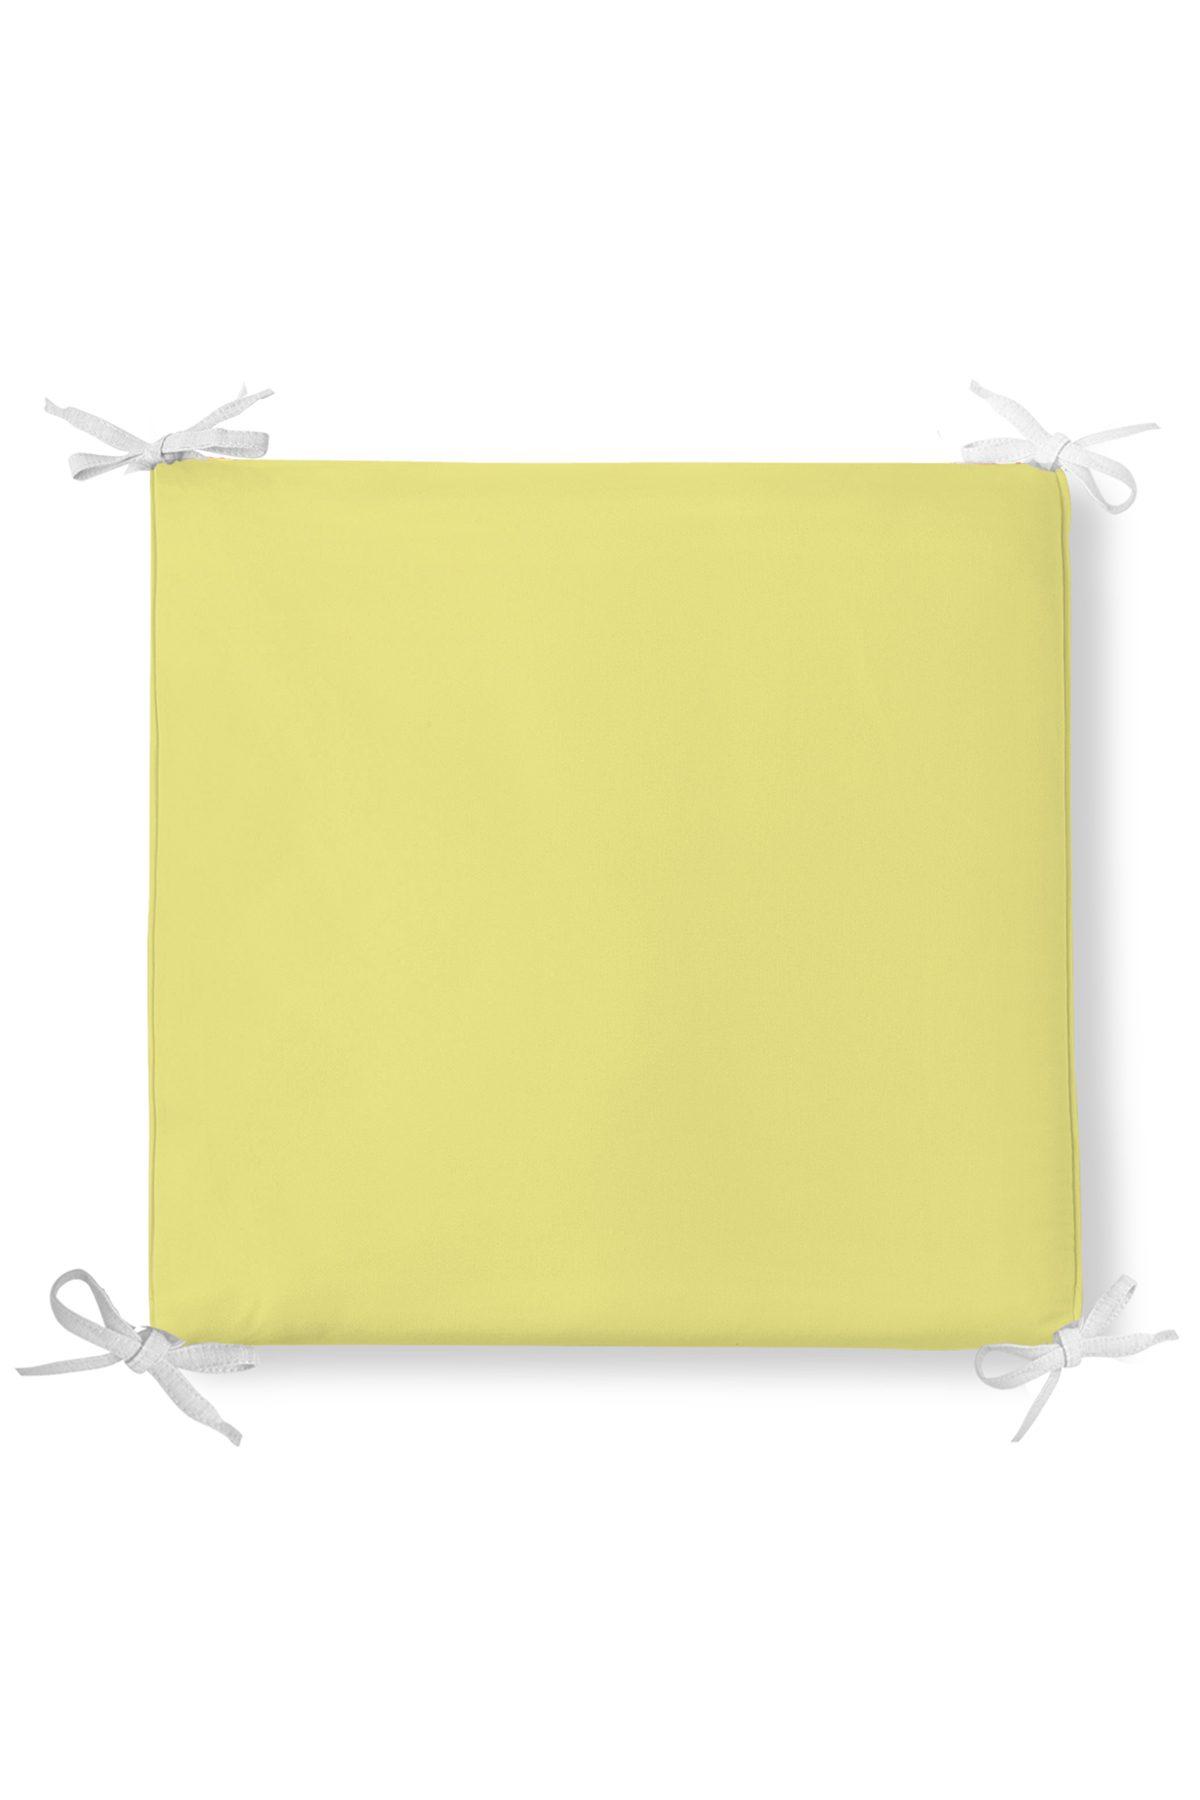 Sarı Renkli Dekorati Kare Sandalye Minderi 40x40cm ermuarlı Realhomes